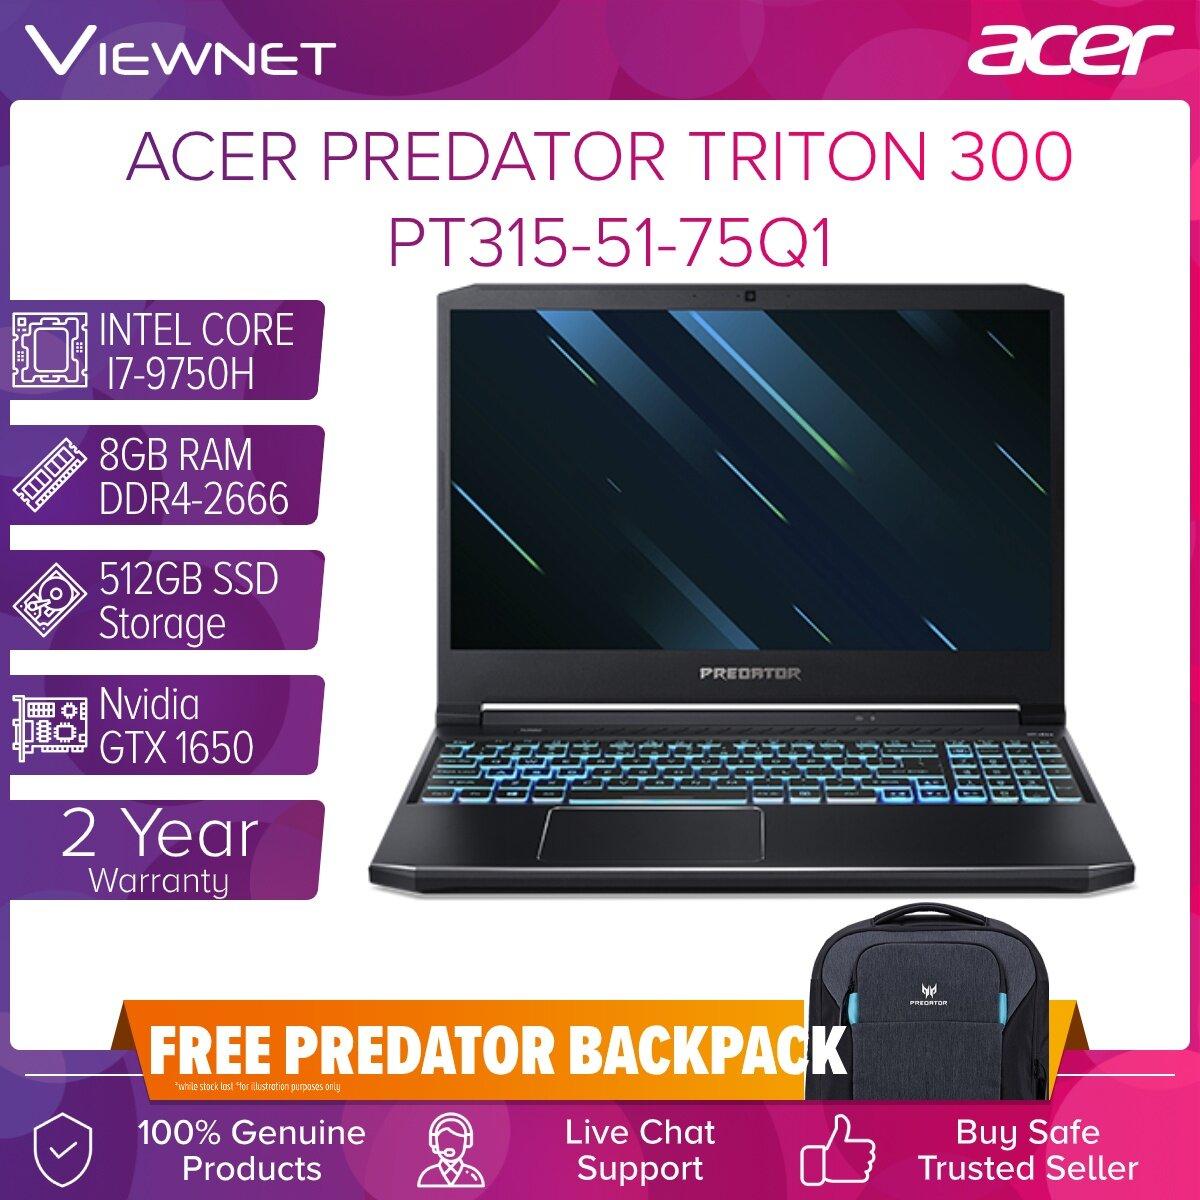 Acer Triton 300 PT315-51-75Q1 Intel Core i7-9750H, 8GB DDR4, 512GB PCIe NVMe SSD, Nvidia GTX 1650 4GB GDDR5, 15.6